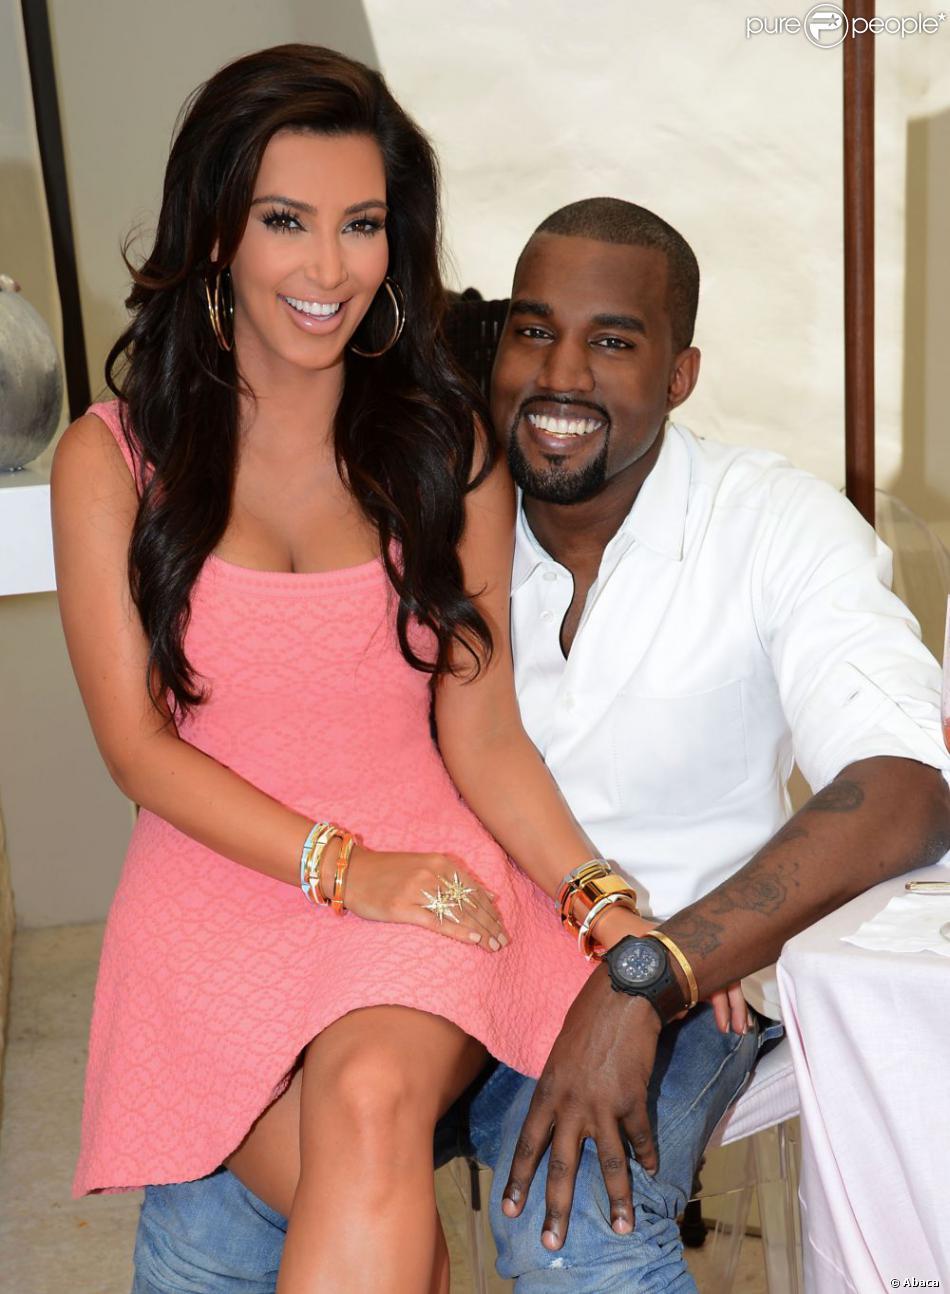 Kim Kardashian et Kanye West à Los Angeles, en mai 2012.